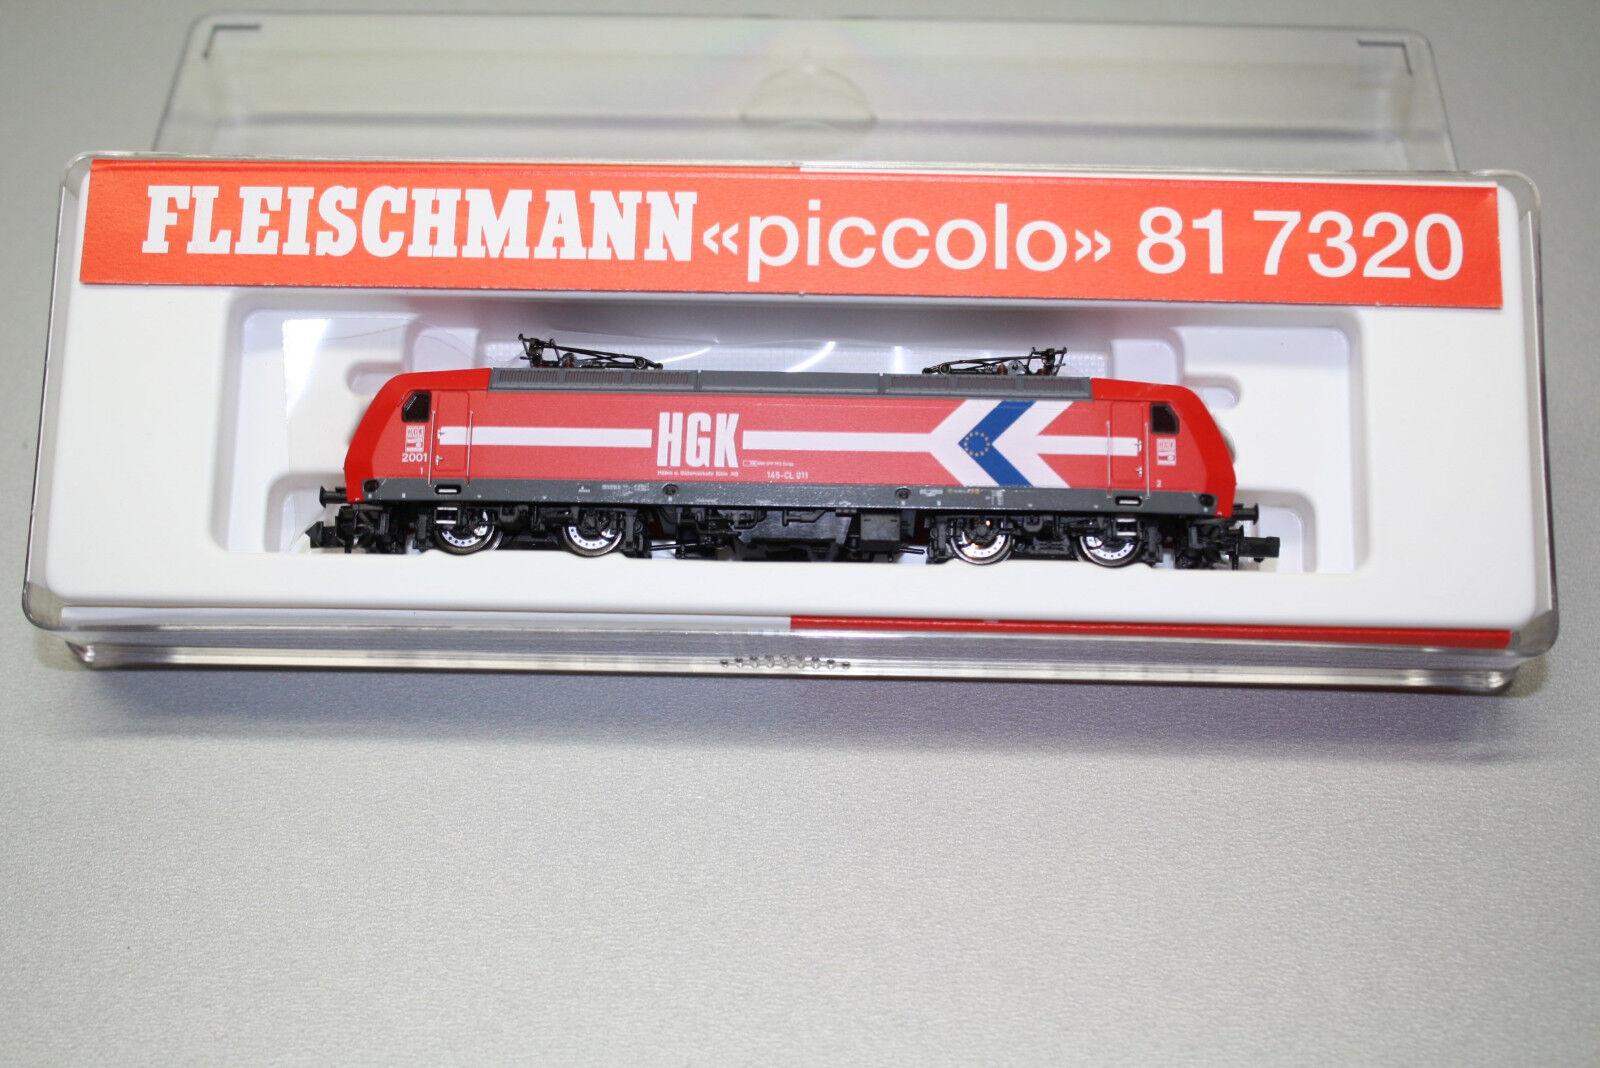 Fleischmann 817320 elok serie 145 hgk pista n OVP